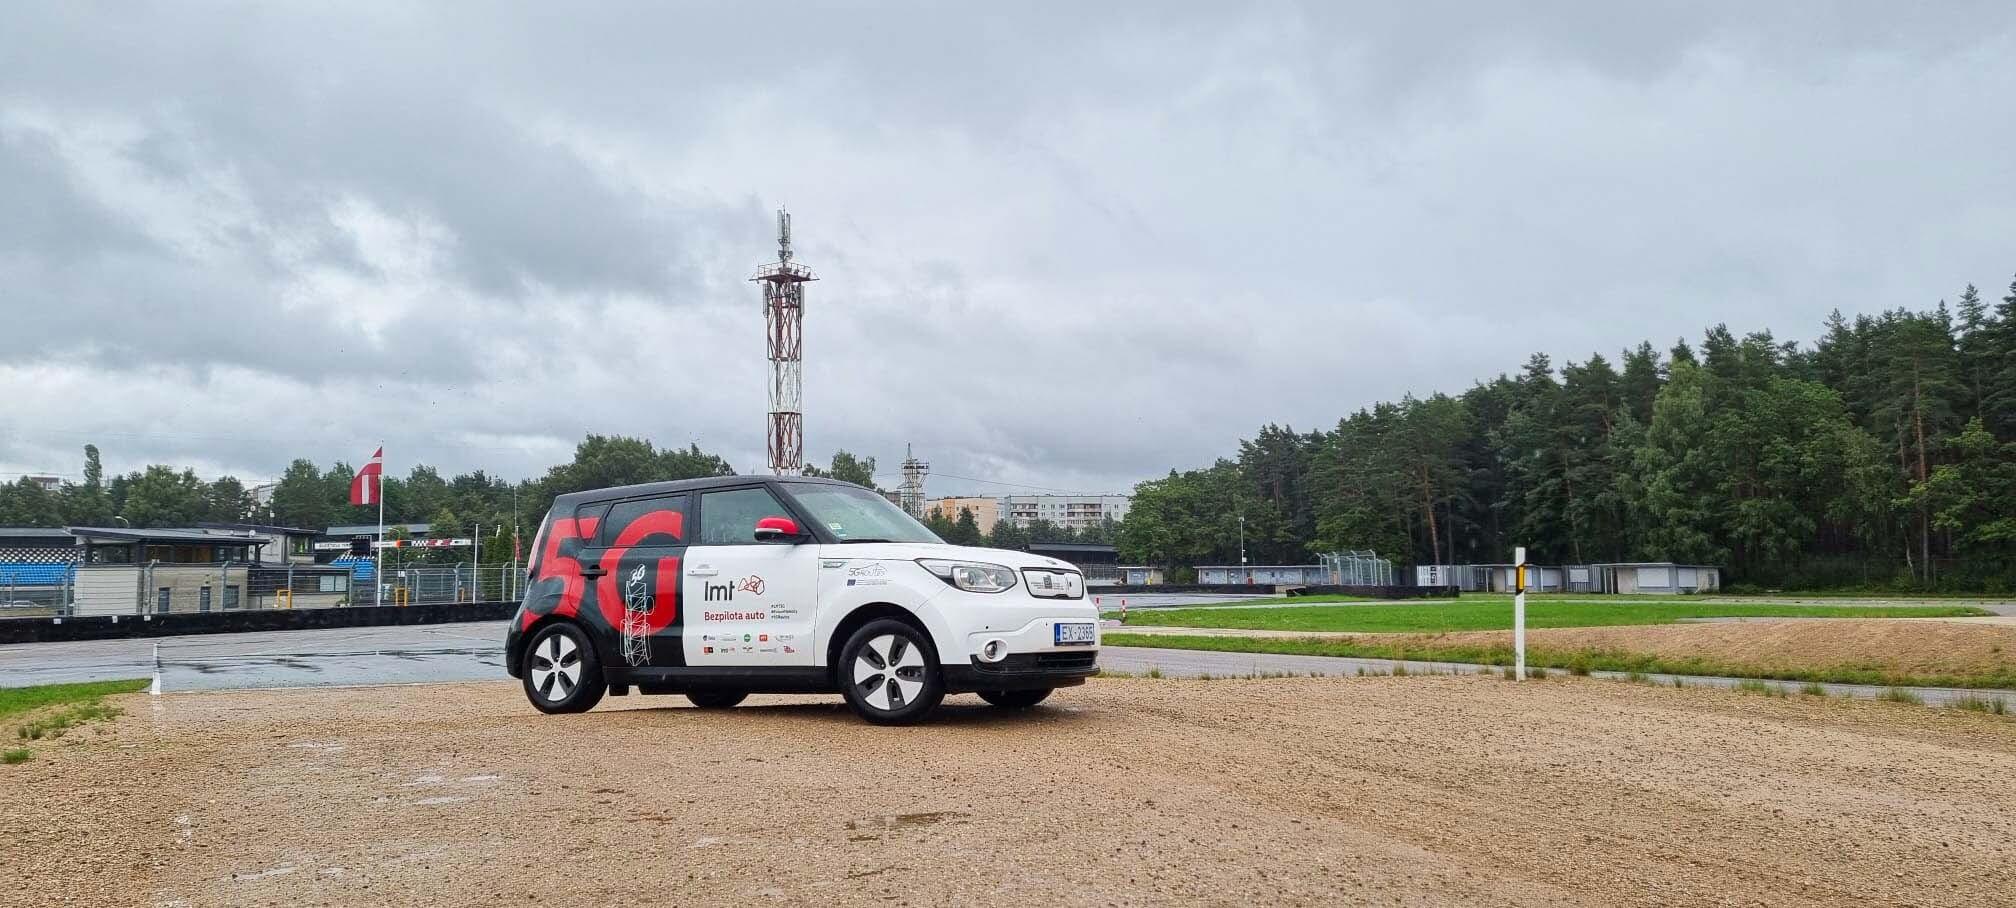 LMT un CSDD Biķerniekos izveido 5G testa trasi